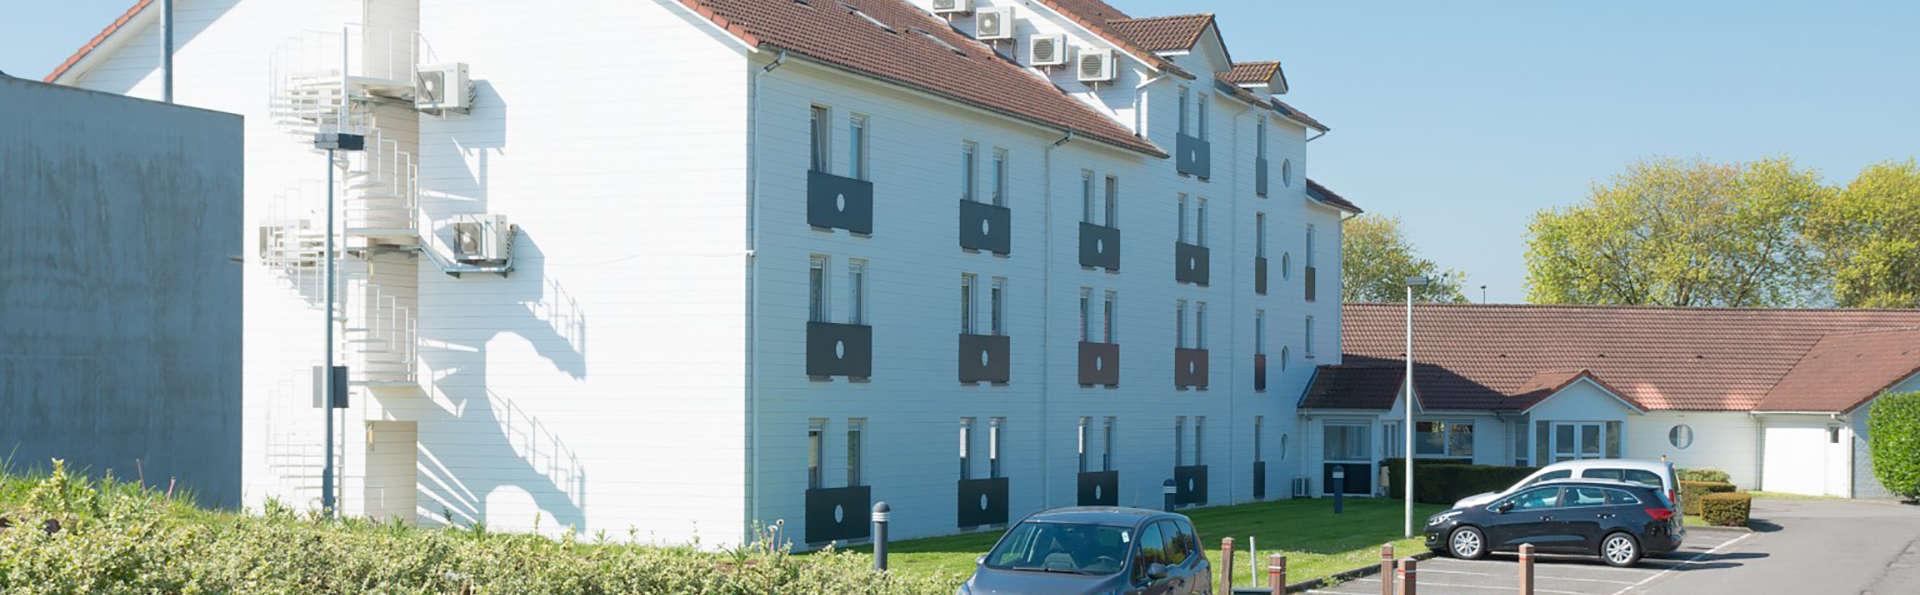 Best Western Hotel Wavre - Edit_Front2.jpg